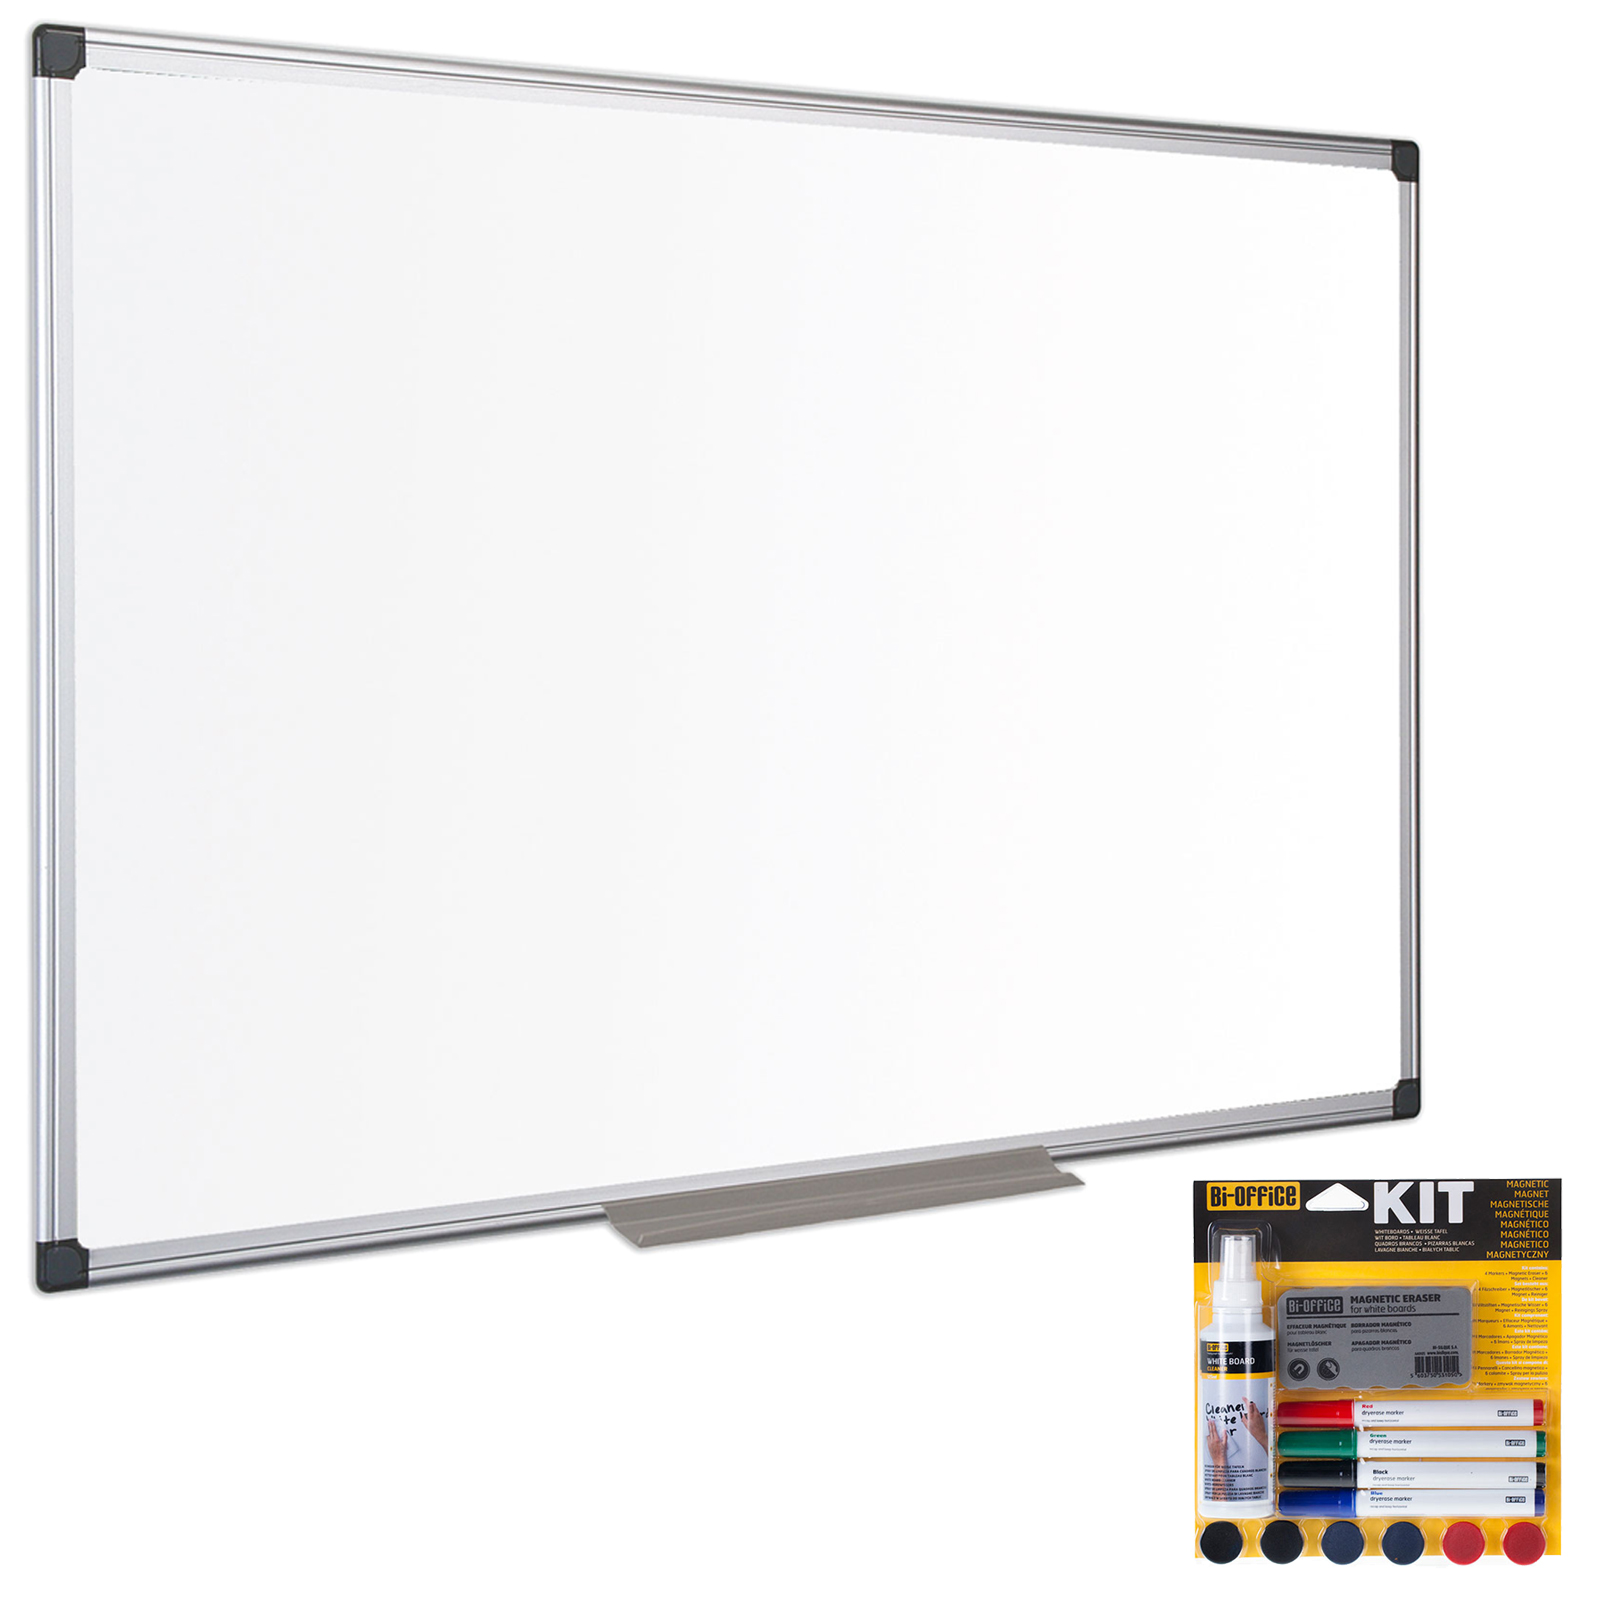 bi office tableau blanc maill 150 x 100 cm bi office kit magn tique offert tableau blanc. Black Bedroom Furniture Sets. Home Design Ideas